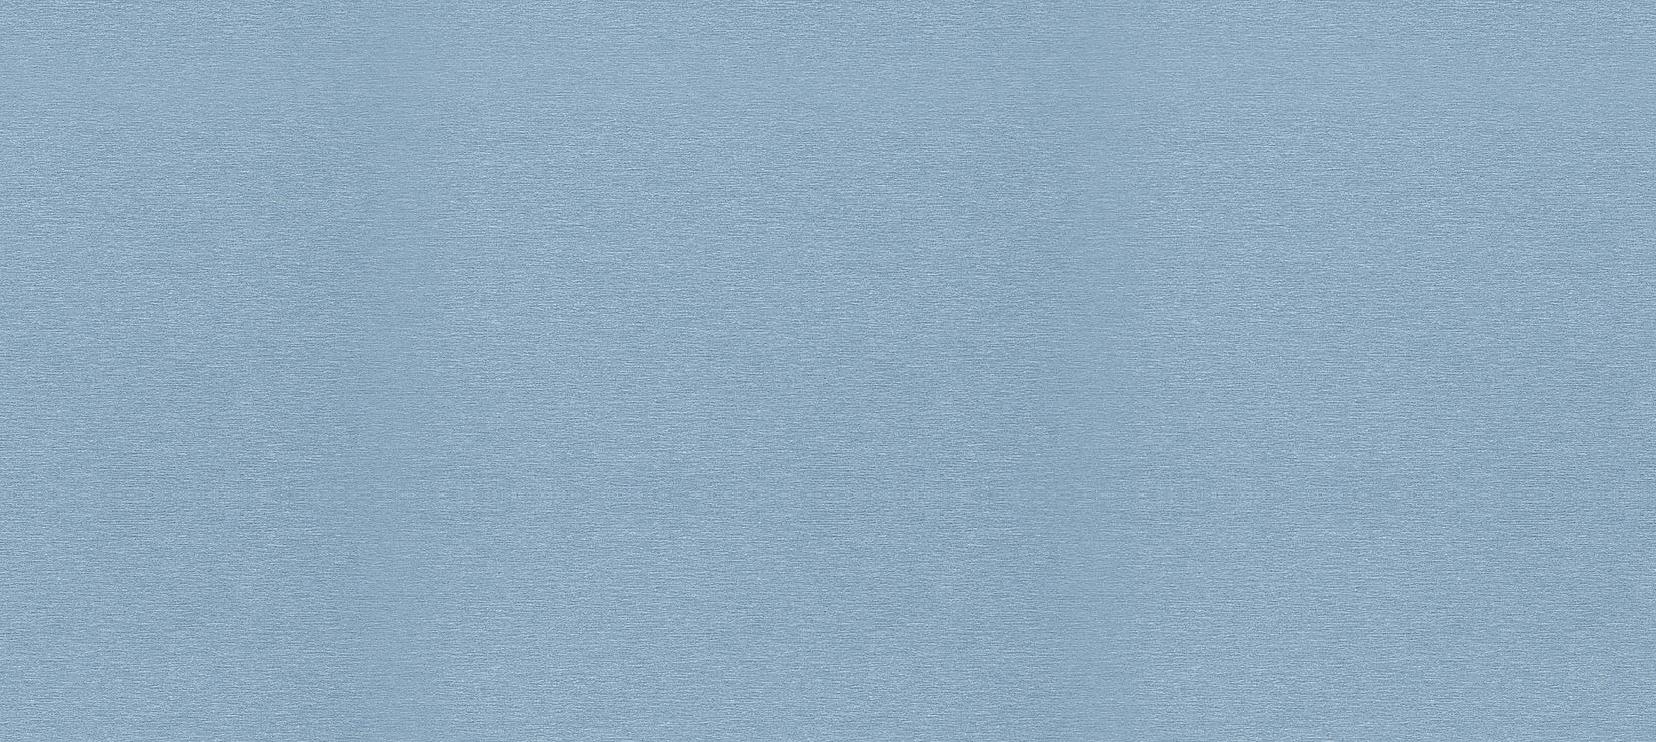 Metbrush silver - Art. 4361002.jpg